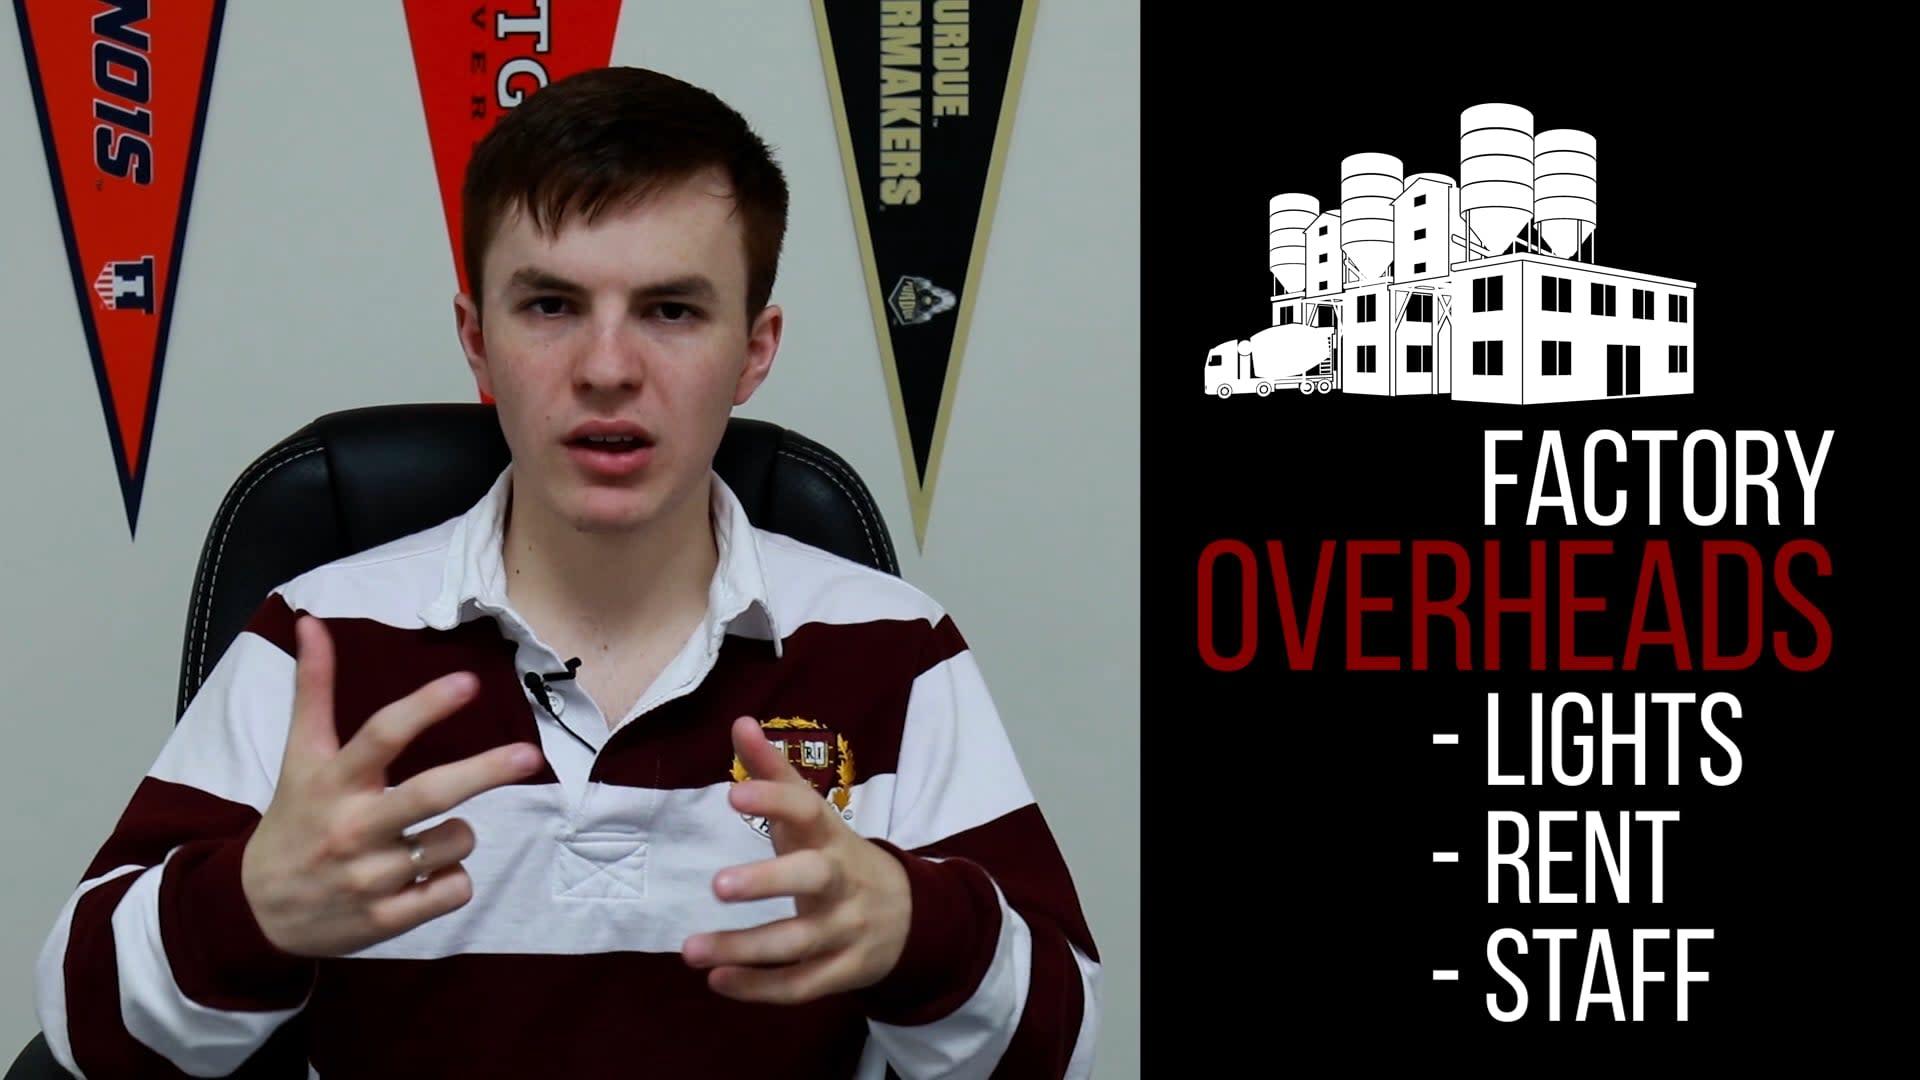 What is Overhead? - Crimson Hub